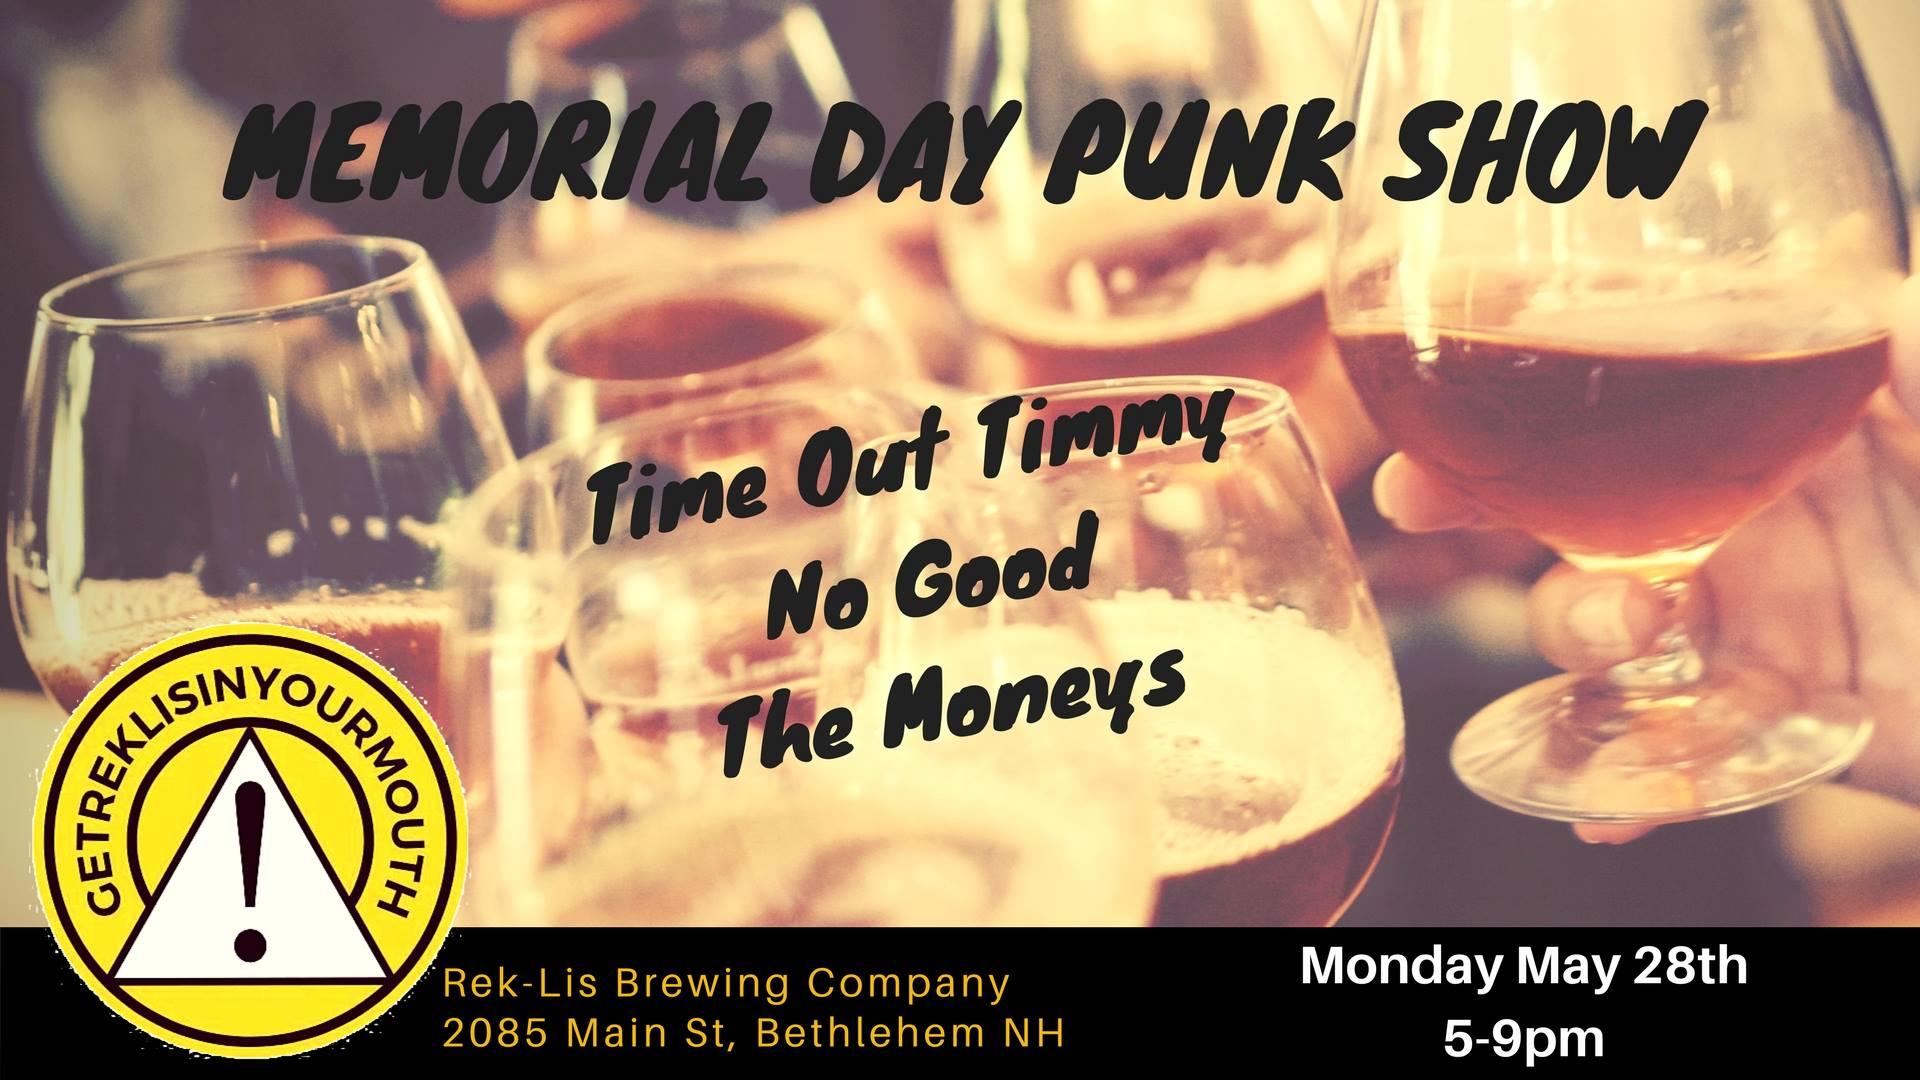 Memorial Day Punk Show.jpg